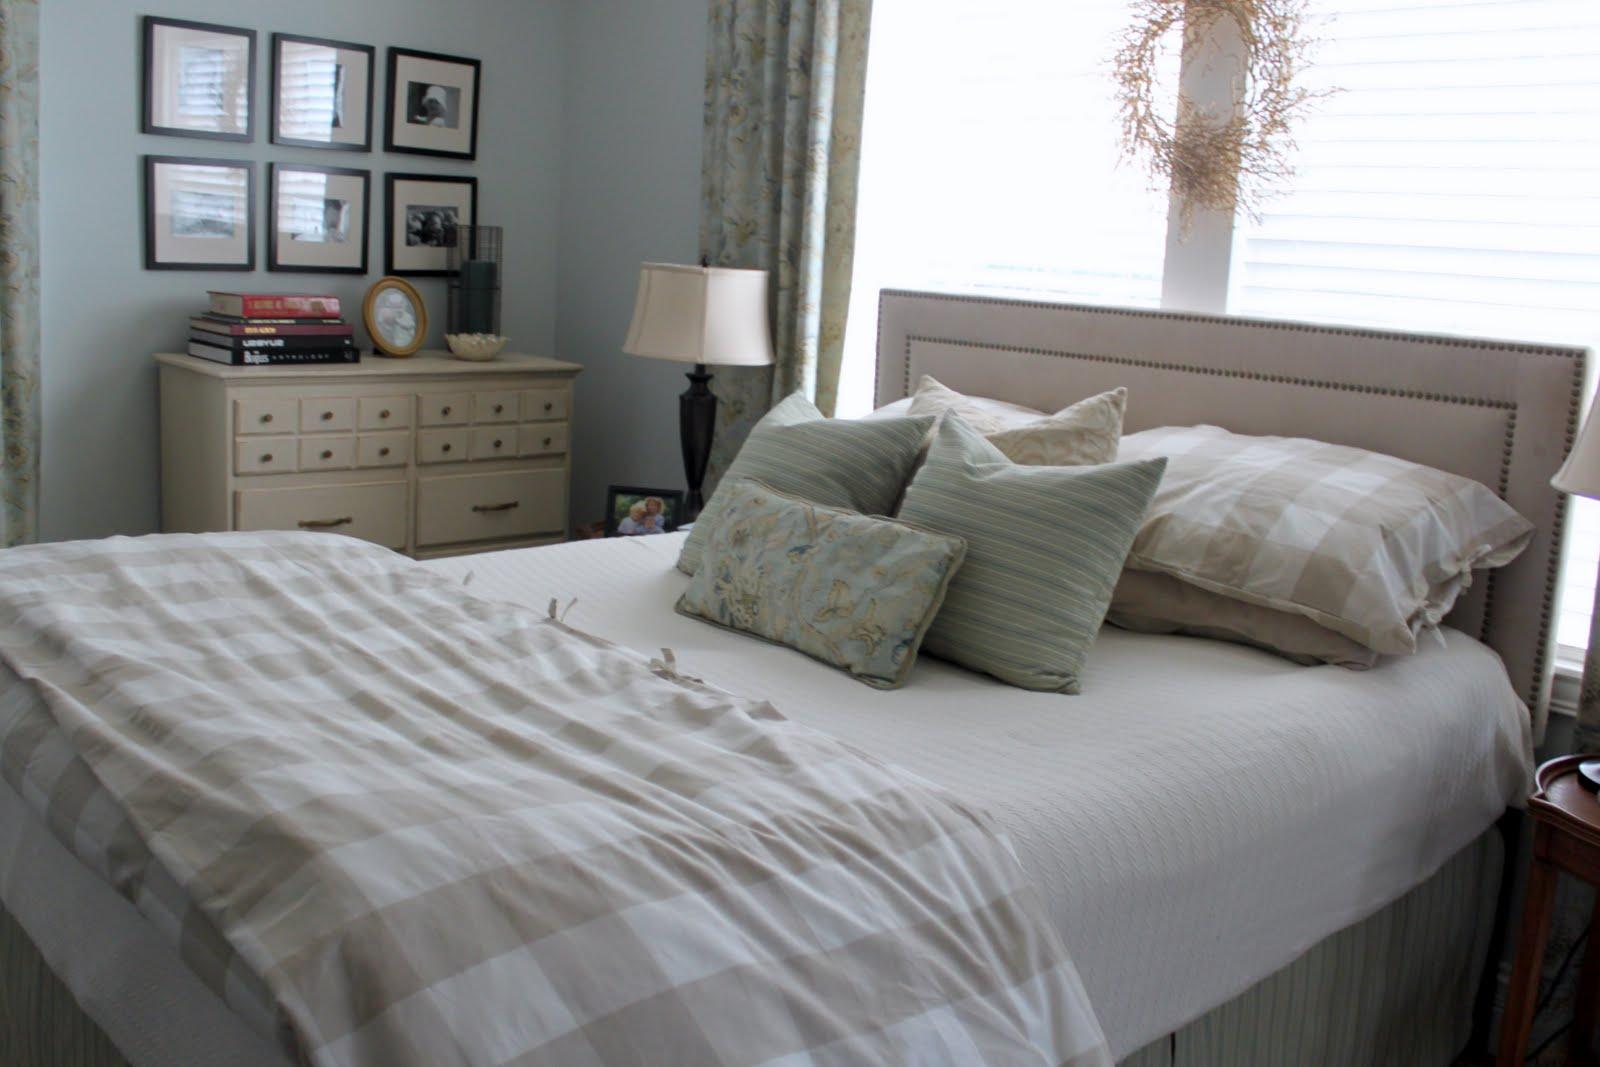 oak ridge revival i heart ikea. Black Bedroom Furniture Sets. Home Design Ideas